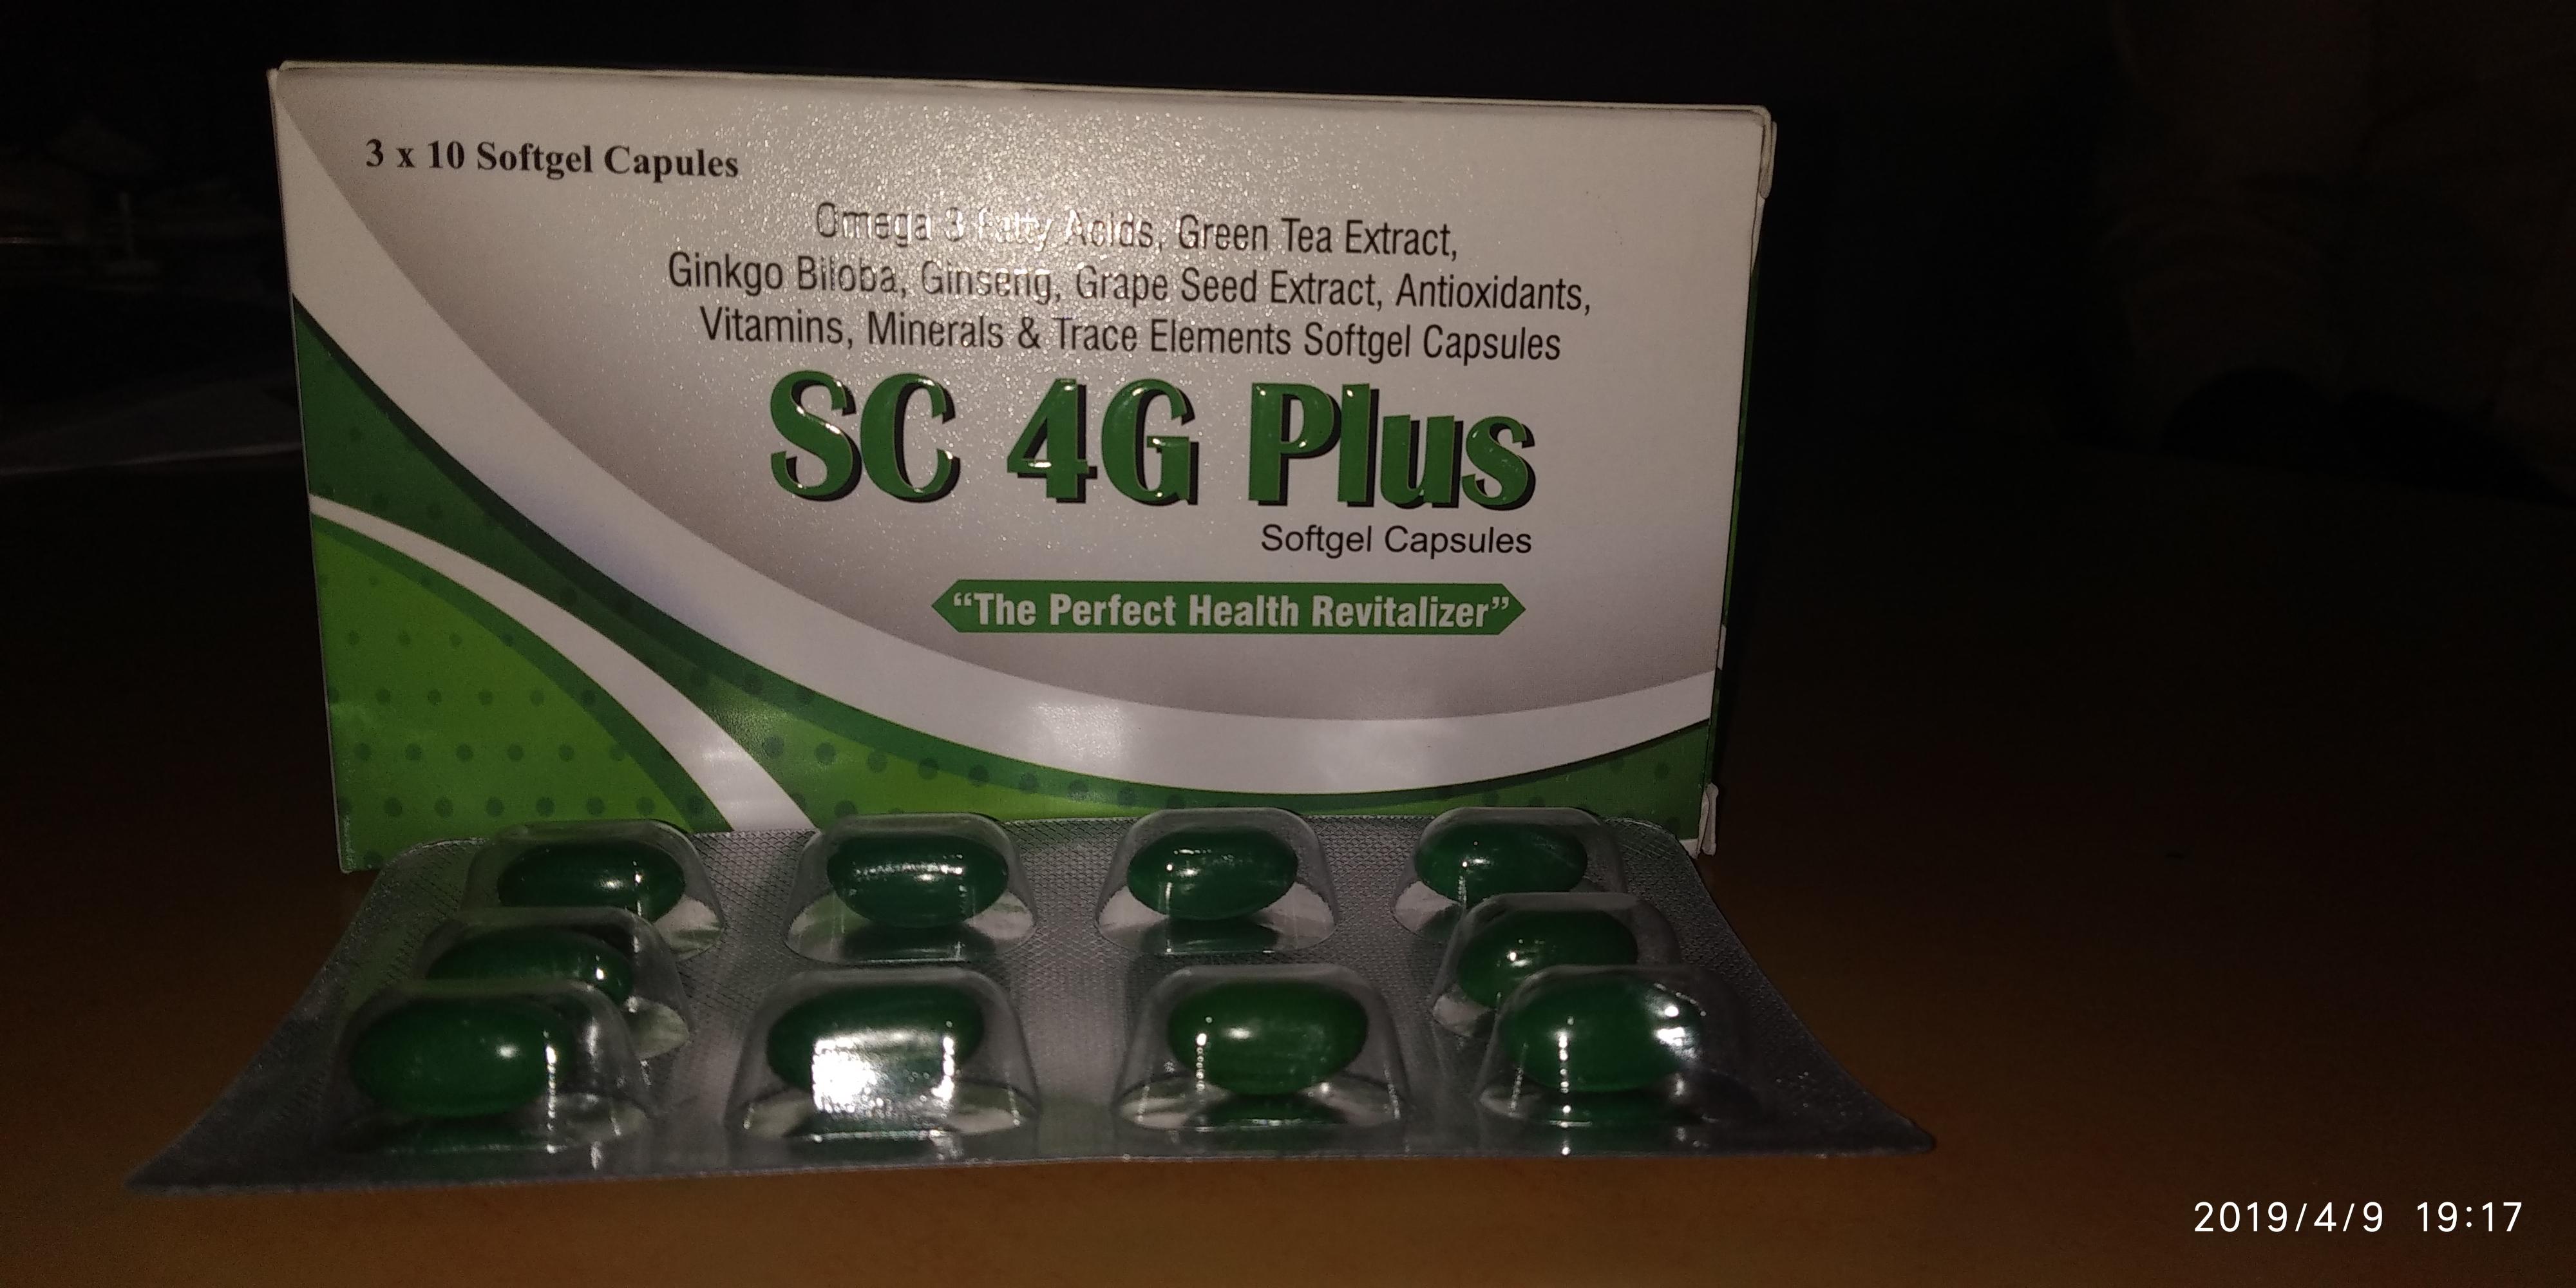 Omega 3 Fatty Acids Softgel Capsules